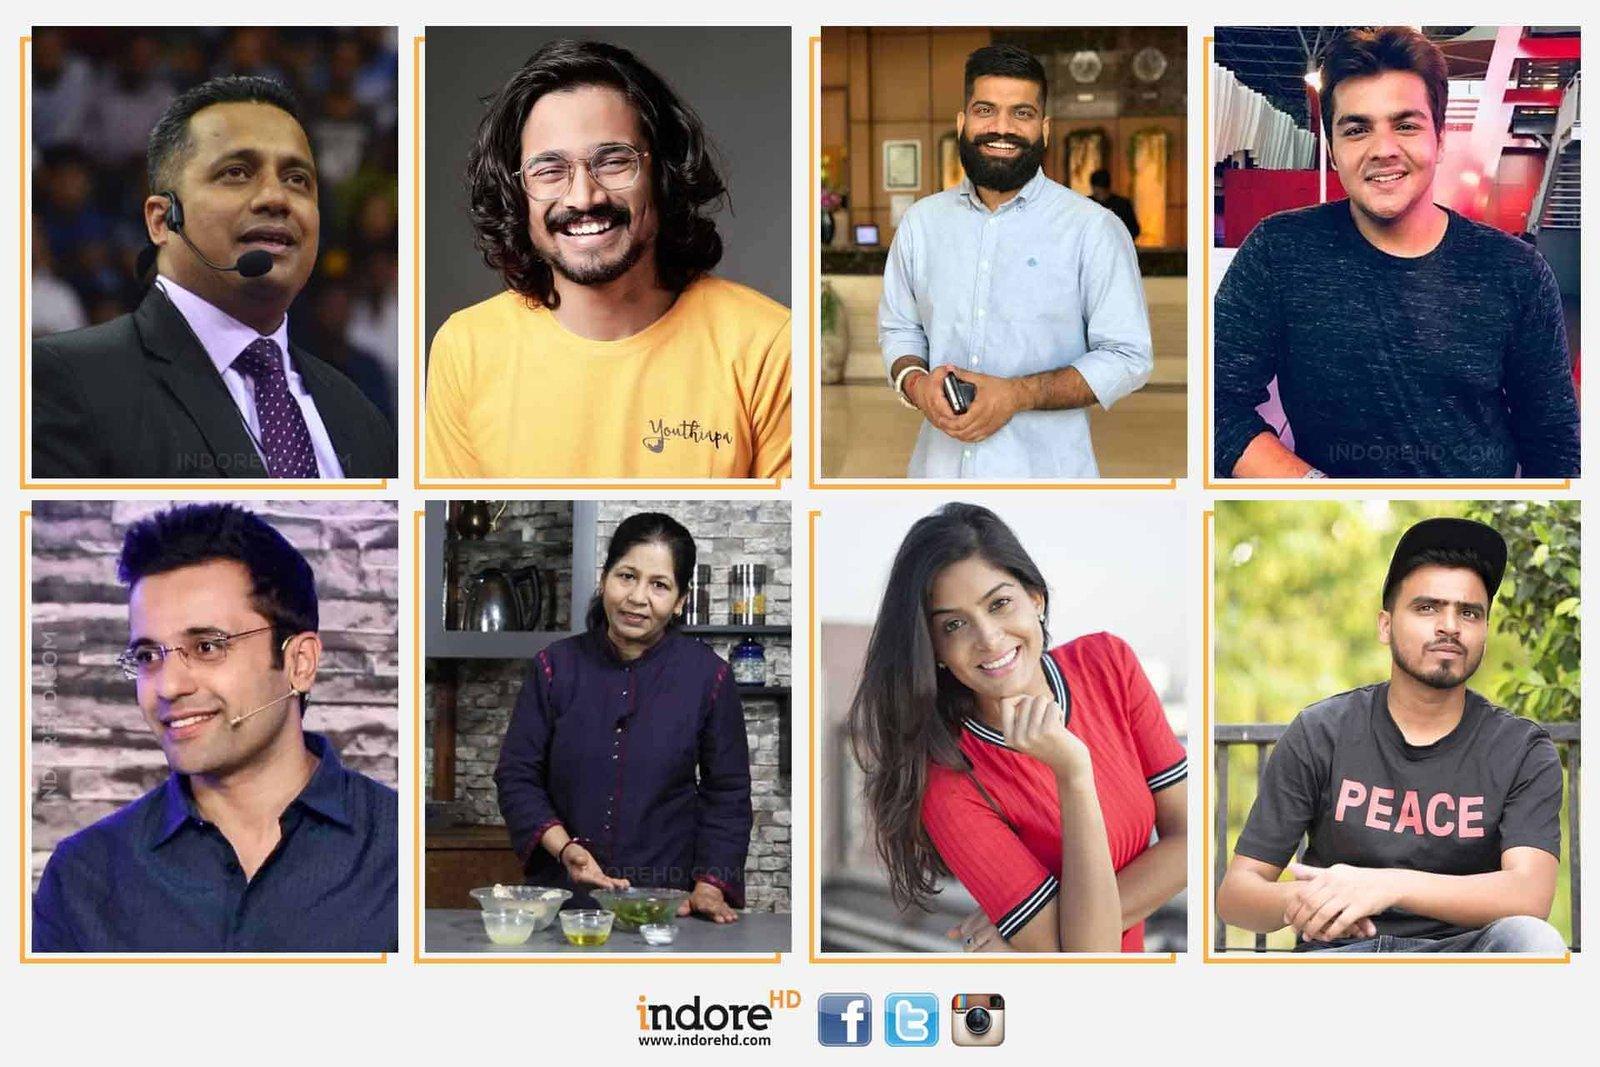 Influencers-Blog-Featured-image-Bhuvan-Bam-Amit-Bhadana-Bhuvan-Bam-(BB-Ki-Vines)-Indore-HD